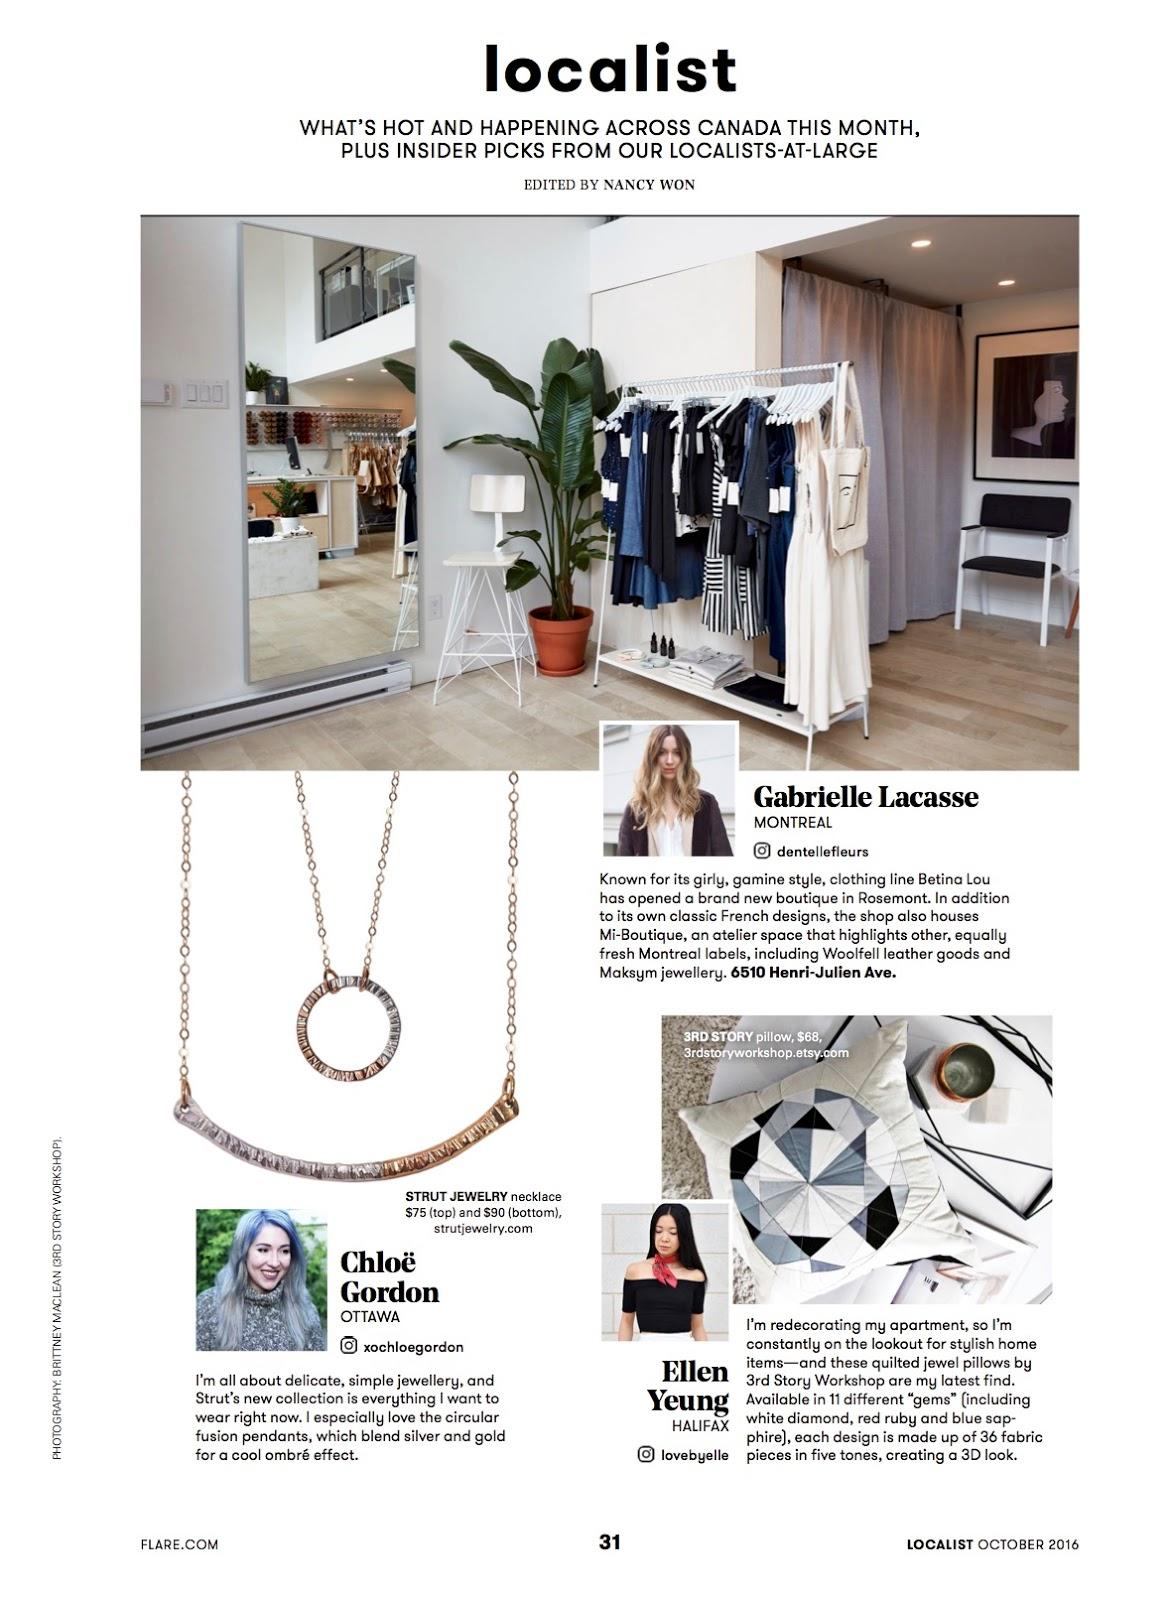 Chloe Gordon year in review 2016 FLARE magazine localist OttAWA